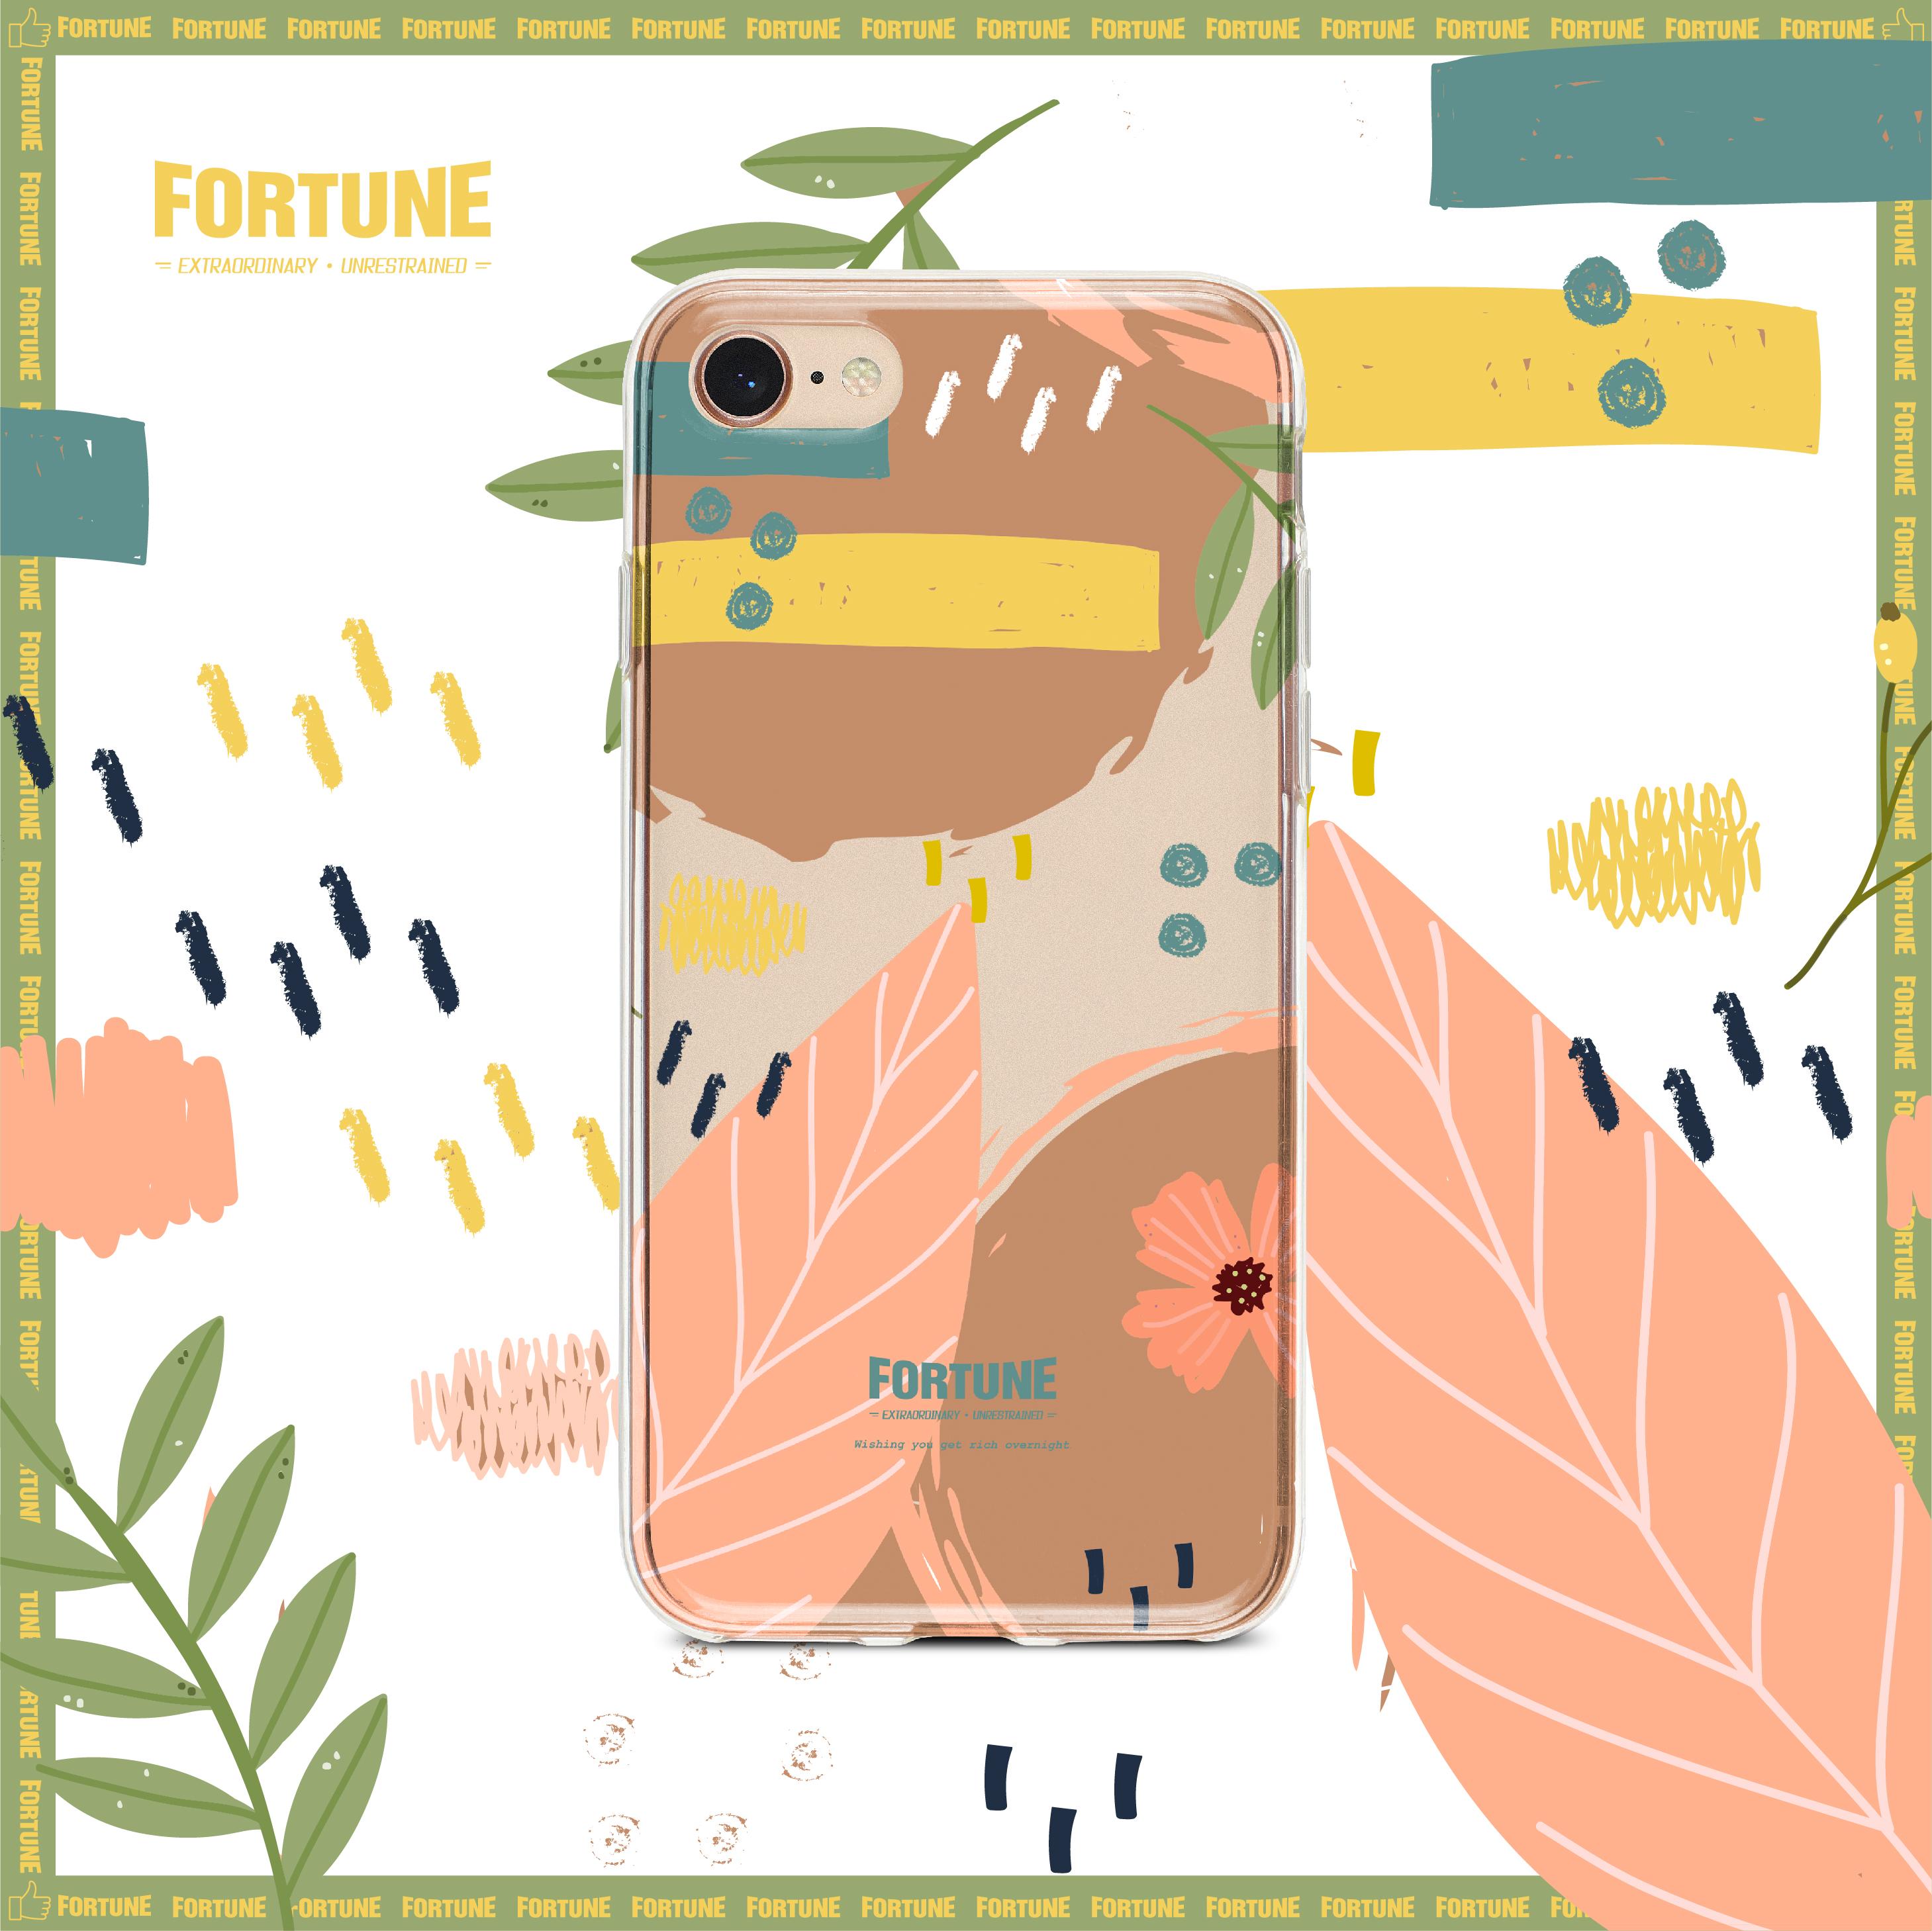 【FORTUNE】原创抽象水彩ins风涂鸦透明手机壳iphone11PRO MAX XR